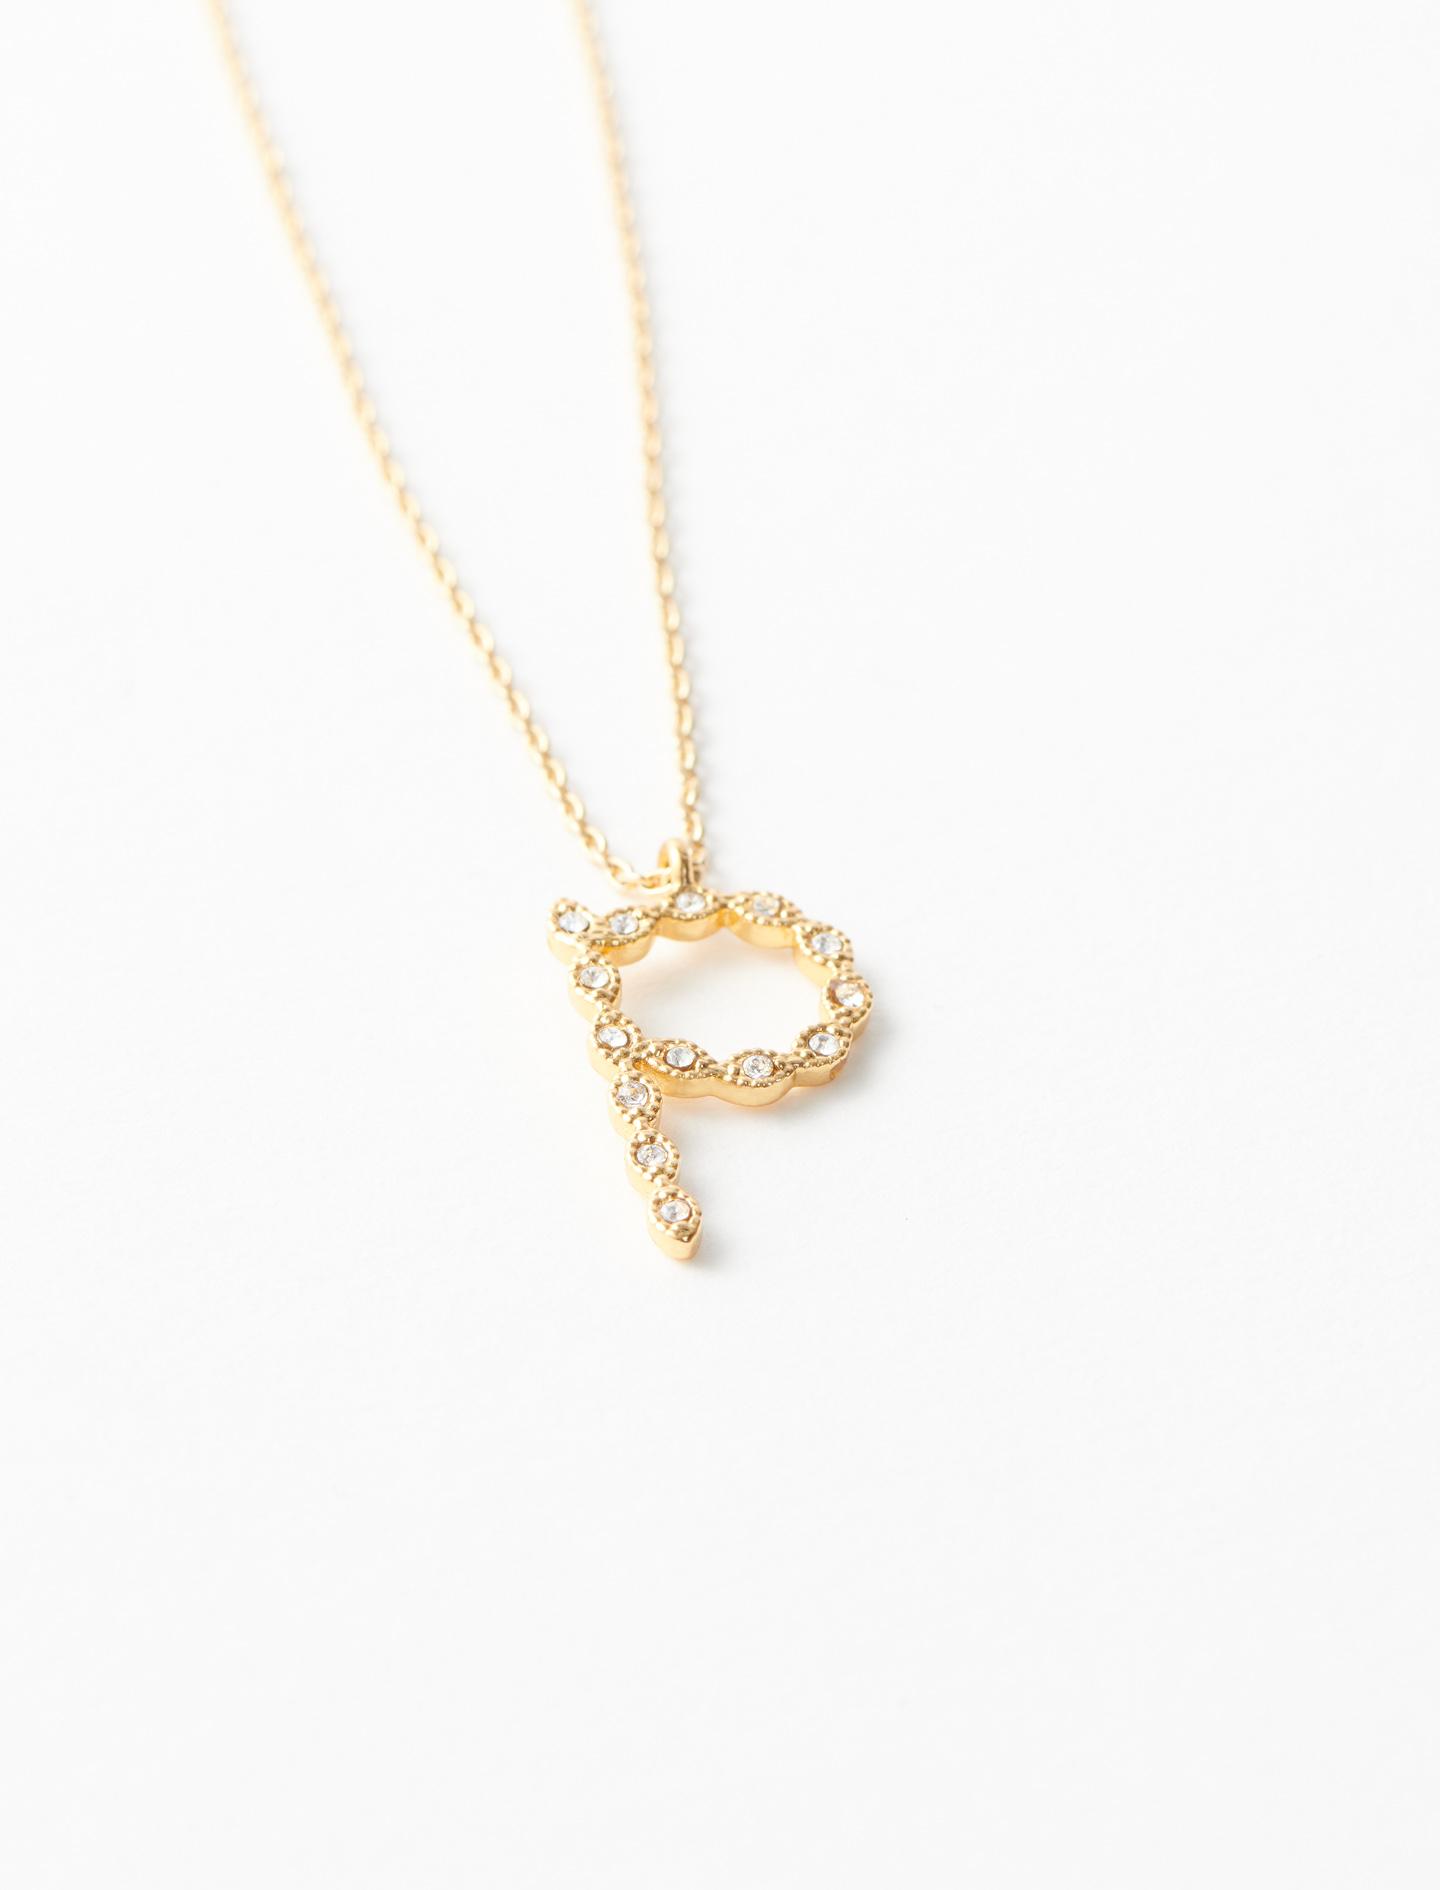 Rhinestone P necklace - Gold